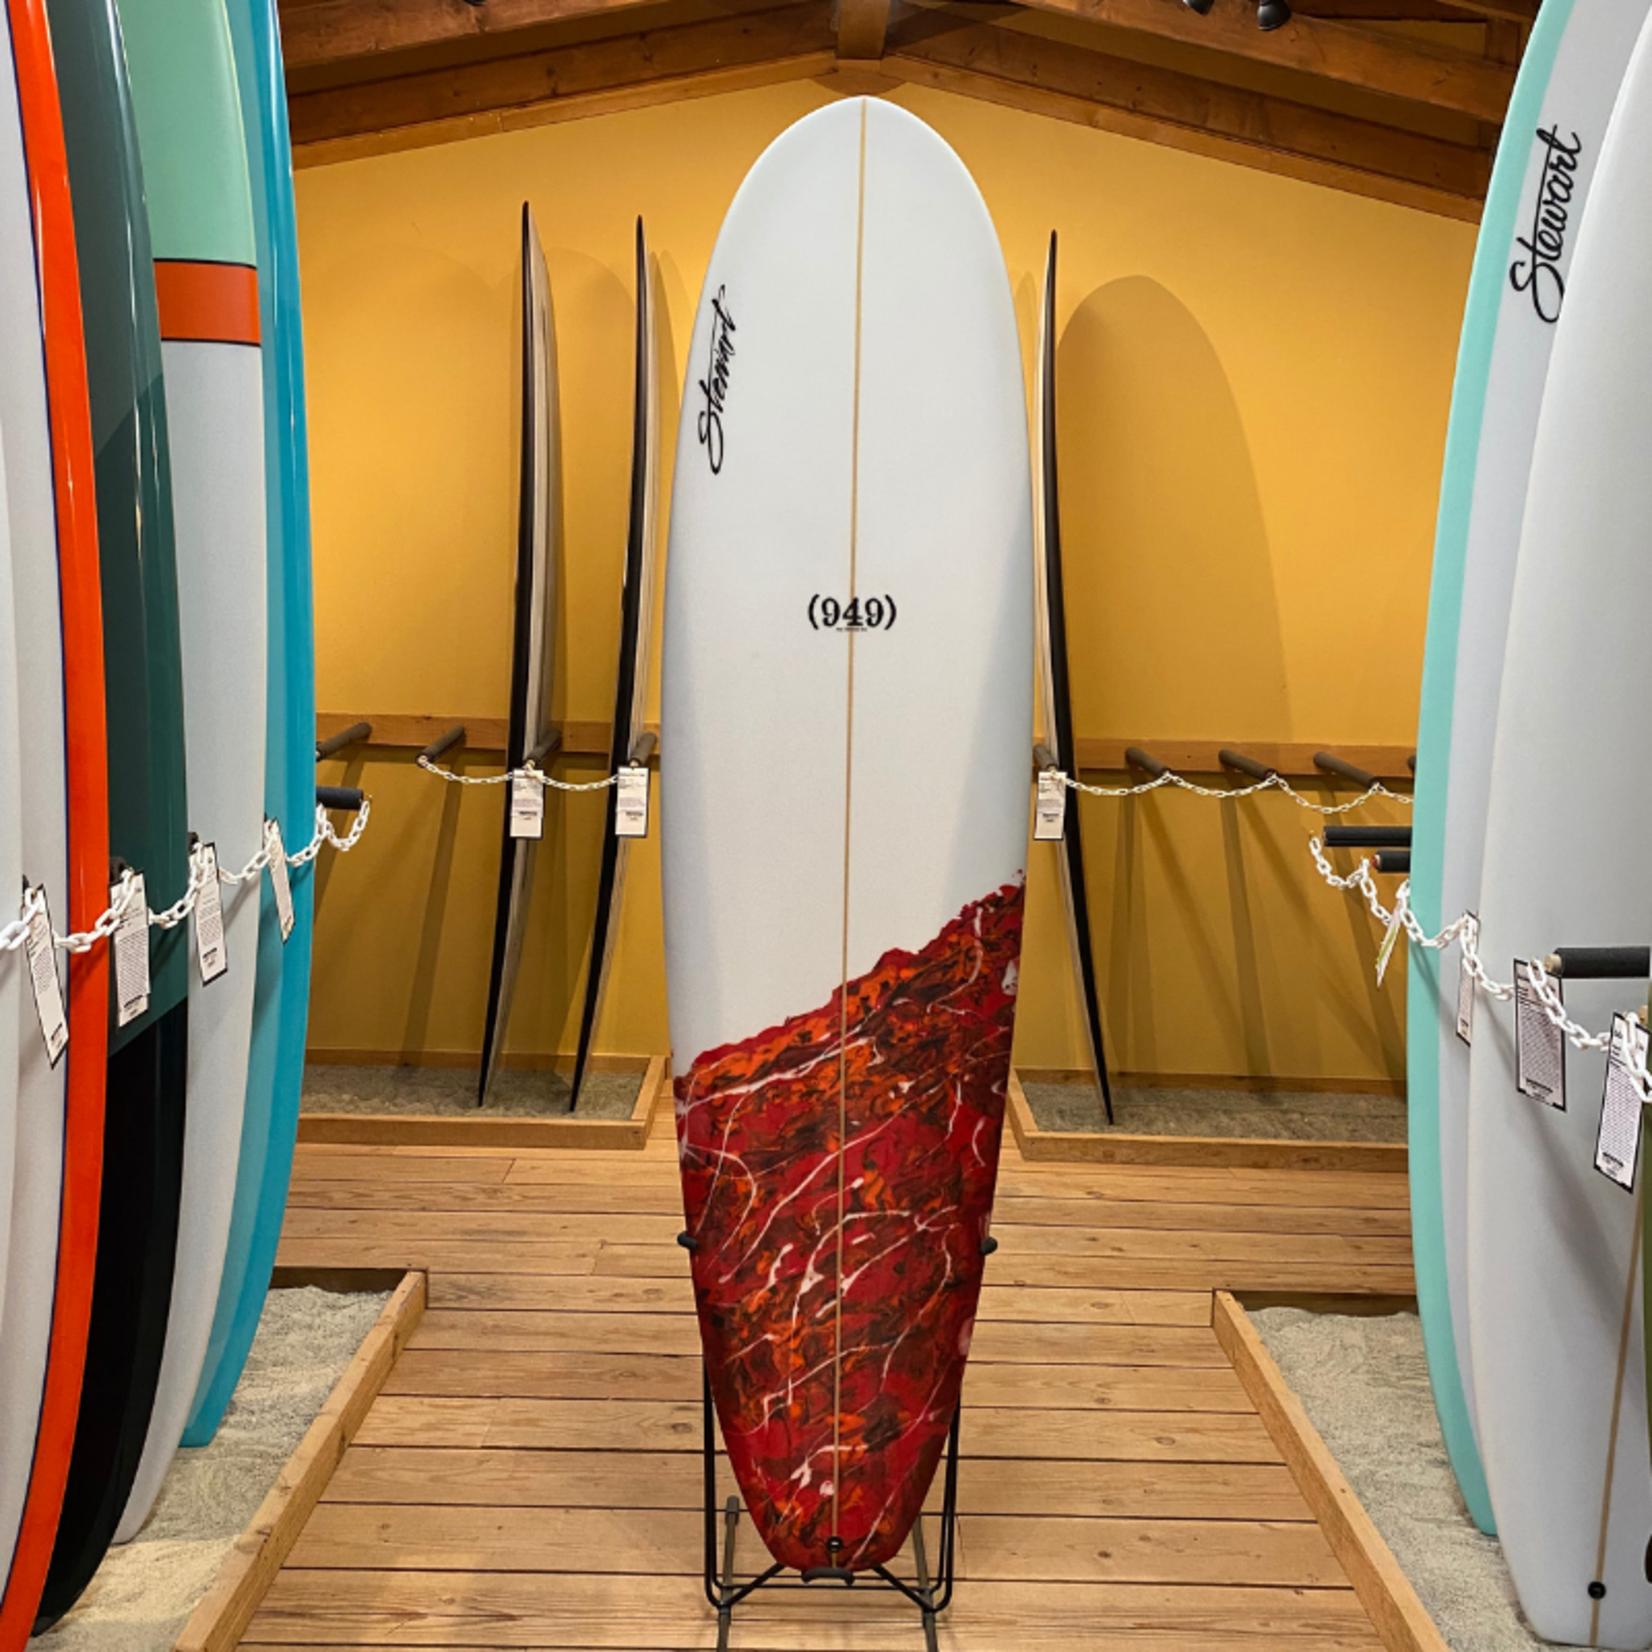 Stewart Surfboards 7'2 Stewart (949) Performance Surfboard #120036